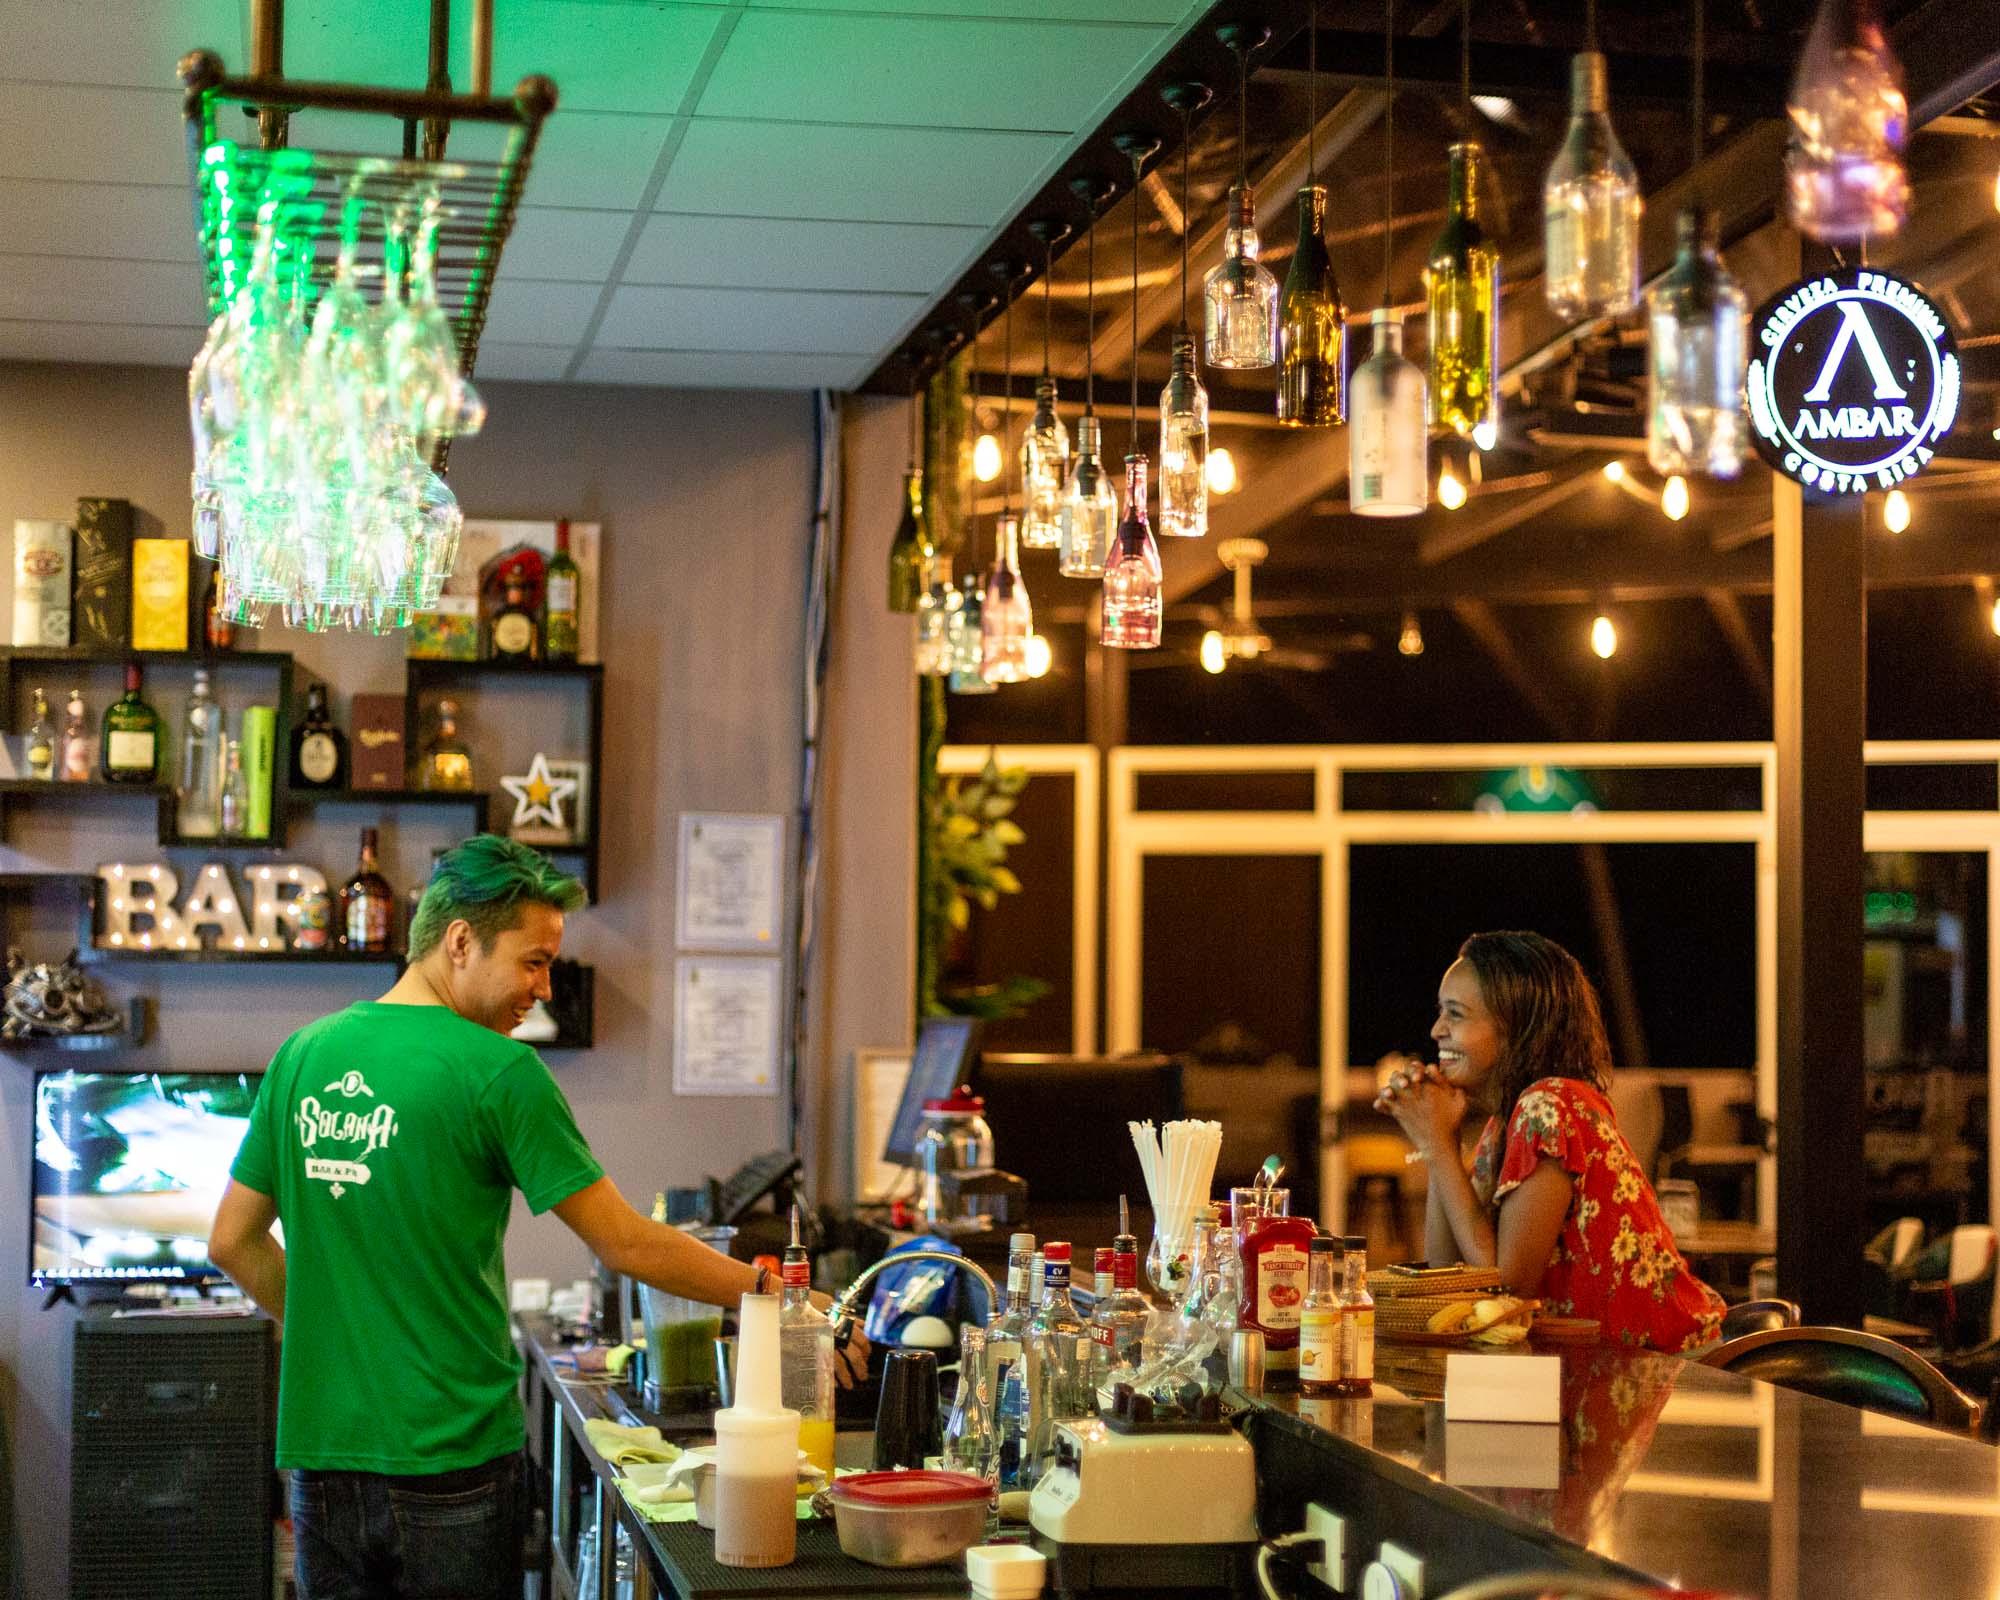 Solana Pub: Hard Rock and Huge Hamburgers In Nicoya